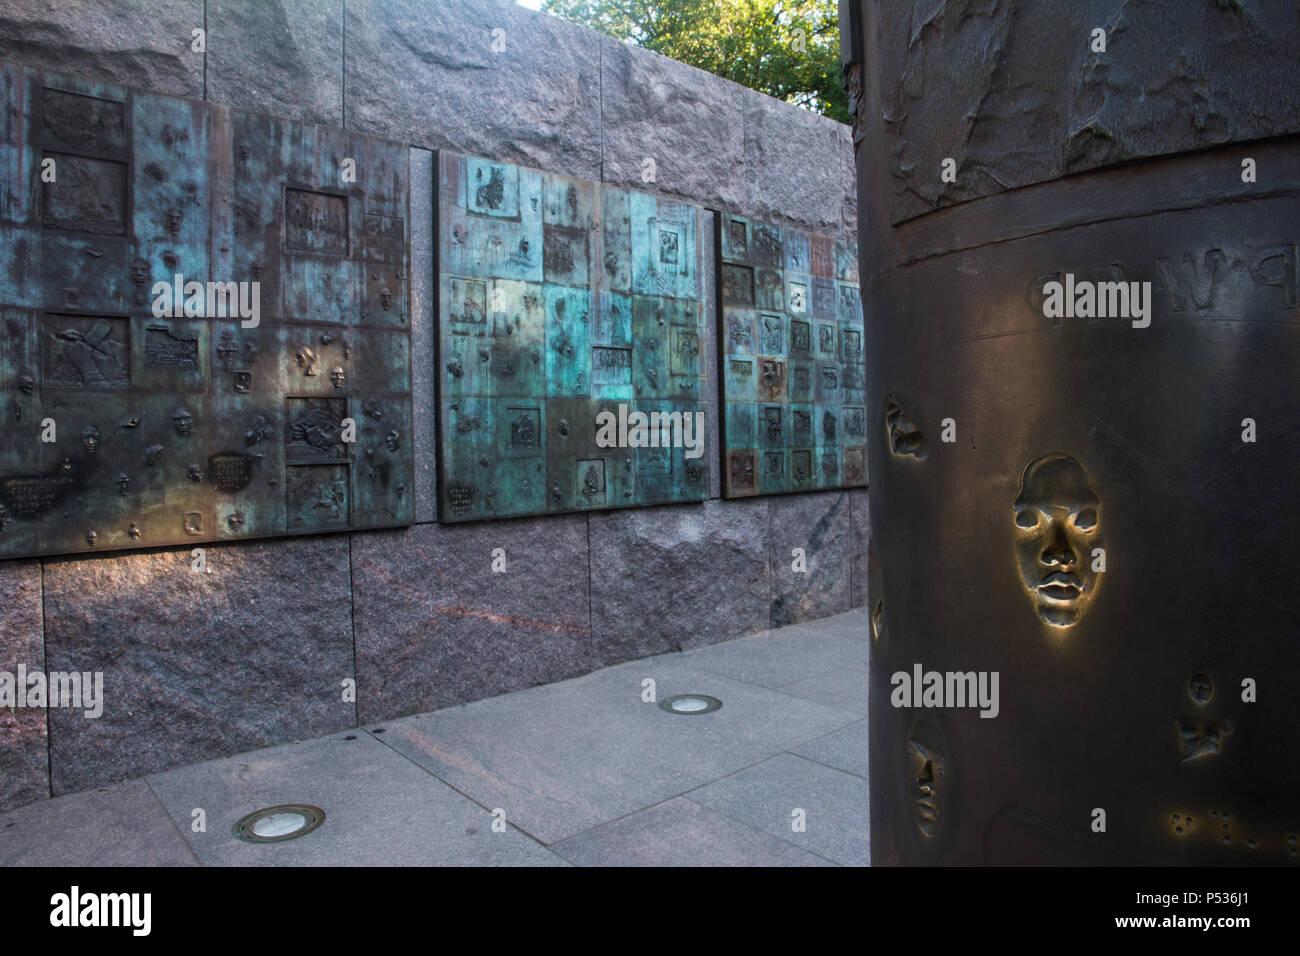 Social Programs bronze releif sculpture in the Franklin Delano Roosevelt Memorial, Washington, DC - Stock Image